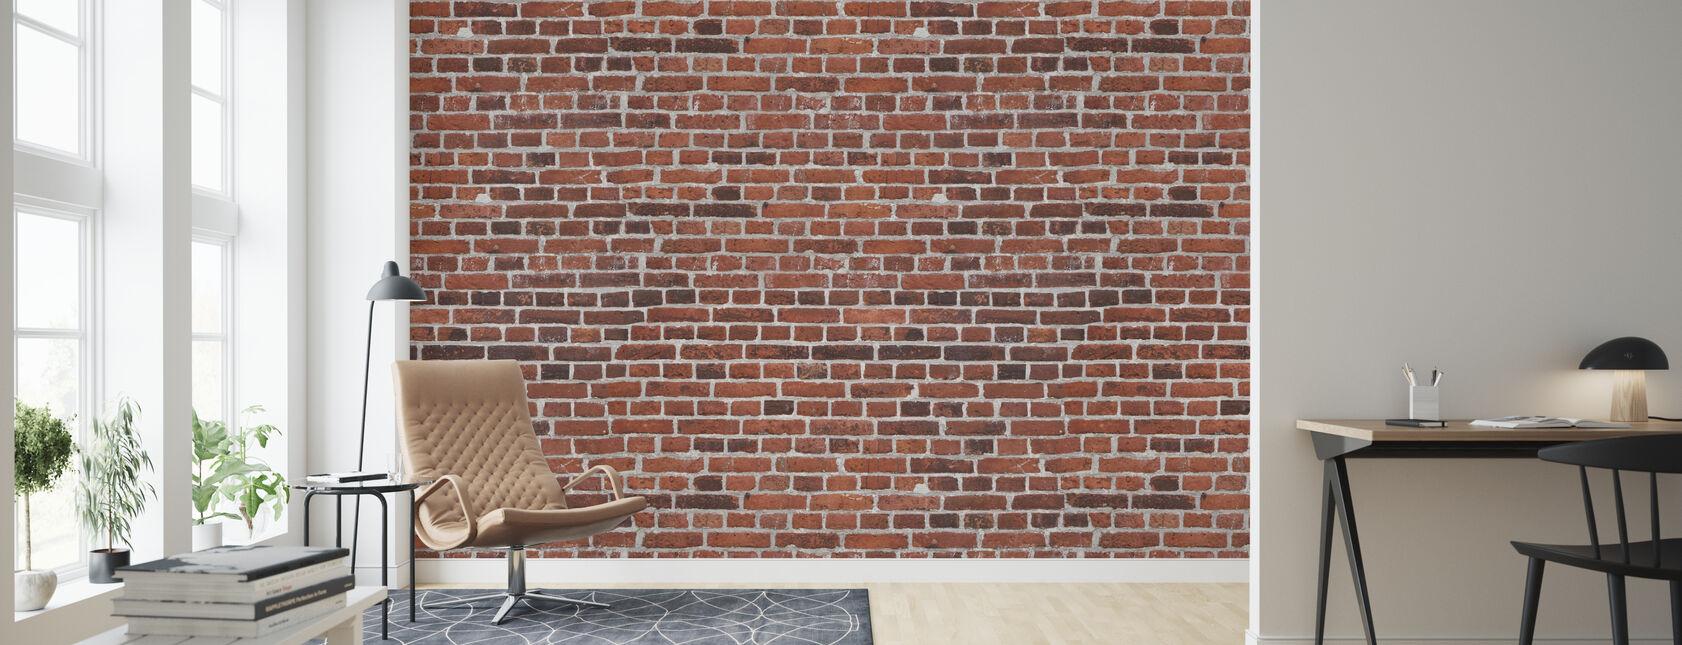 Grafeld bakstenen muur - Behang - Woonkamer